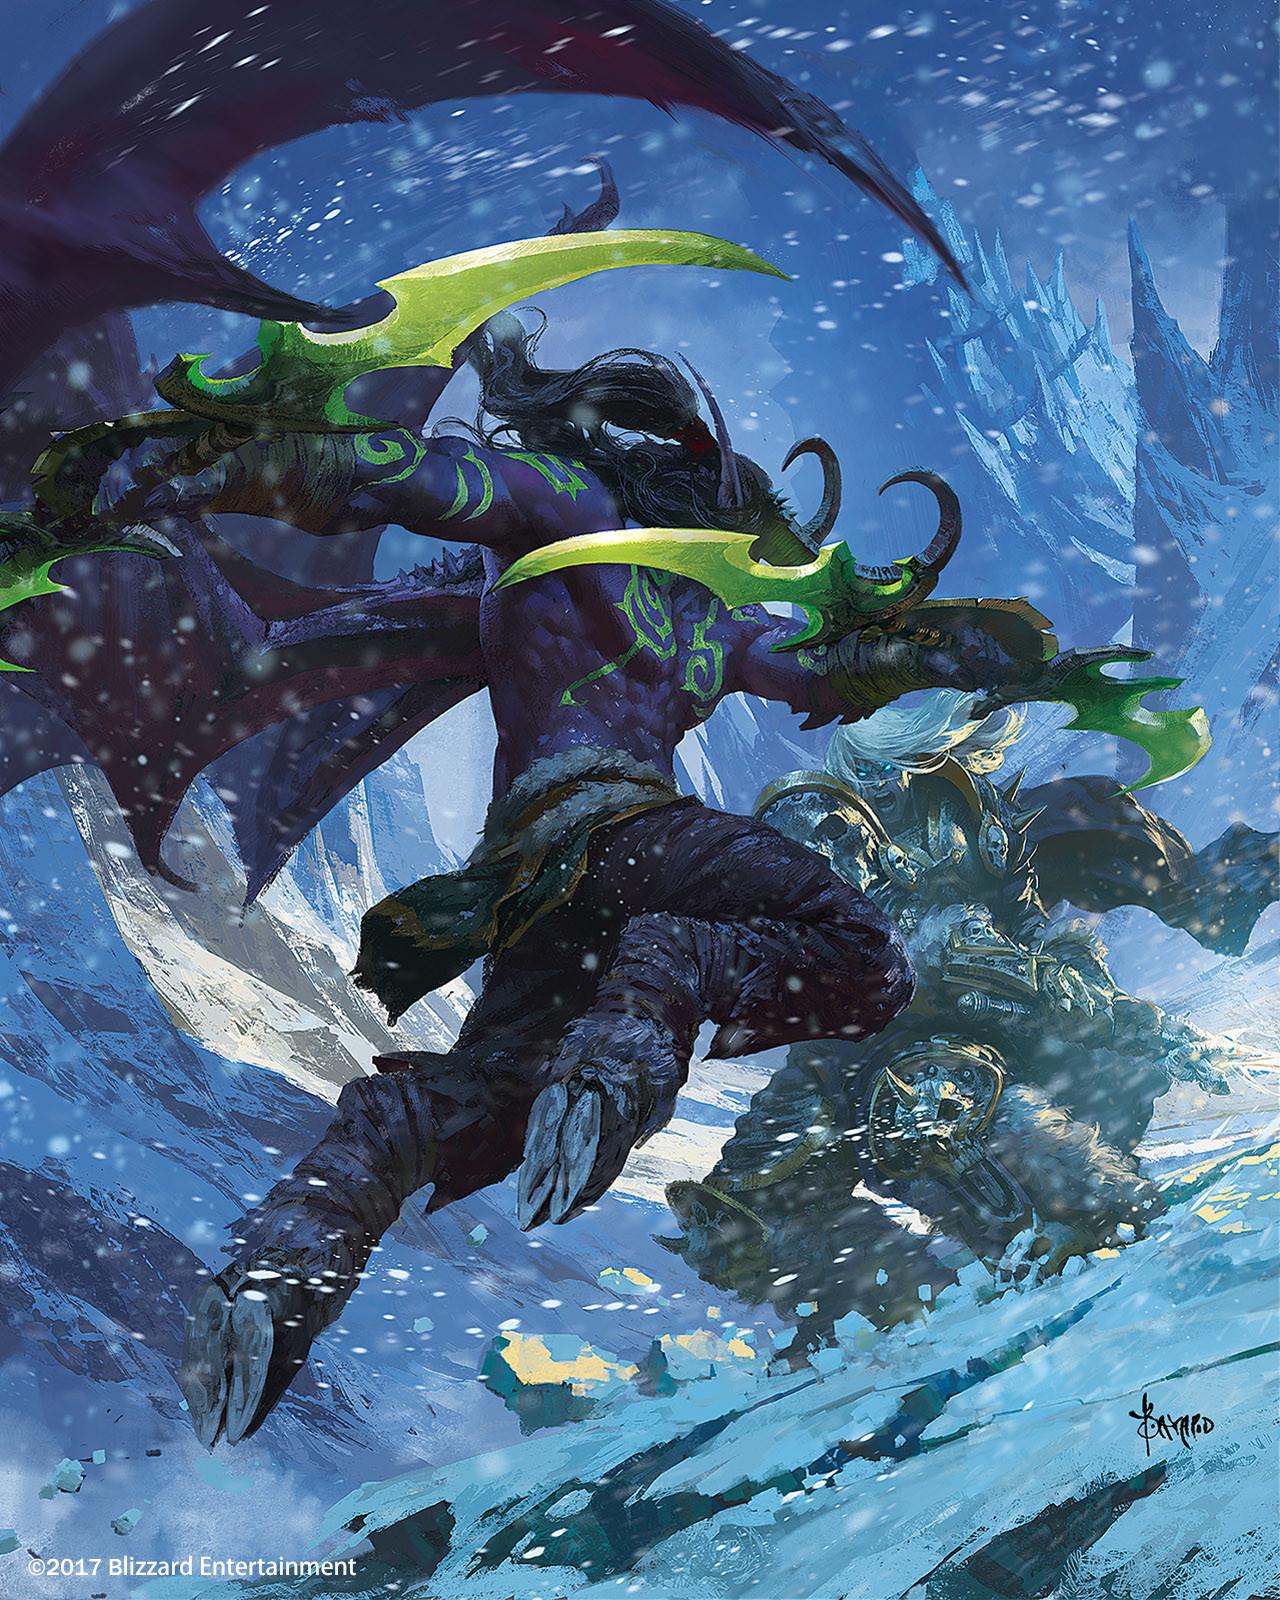 Bayard wu 017 arthas fighting illidan